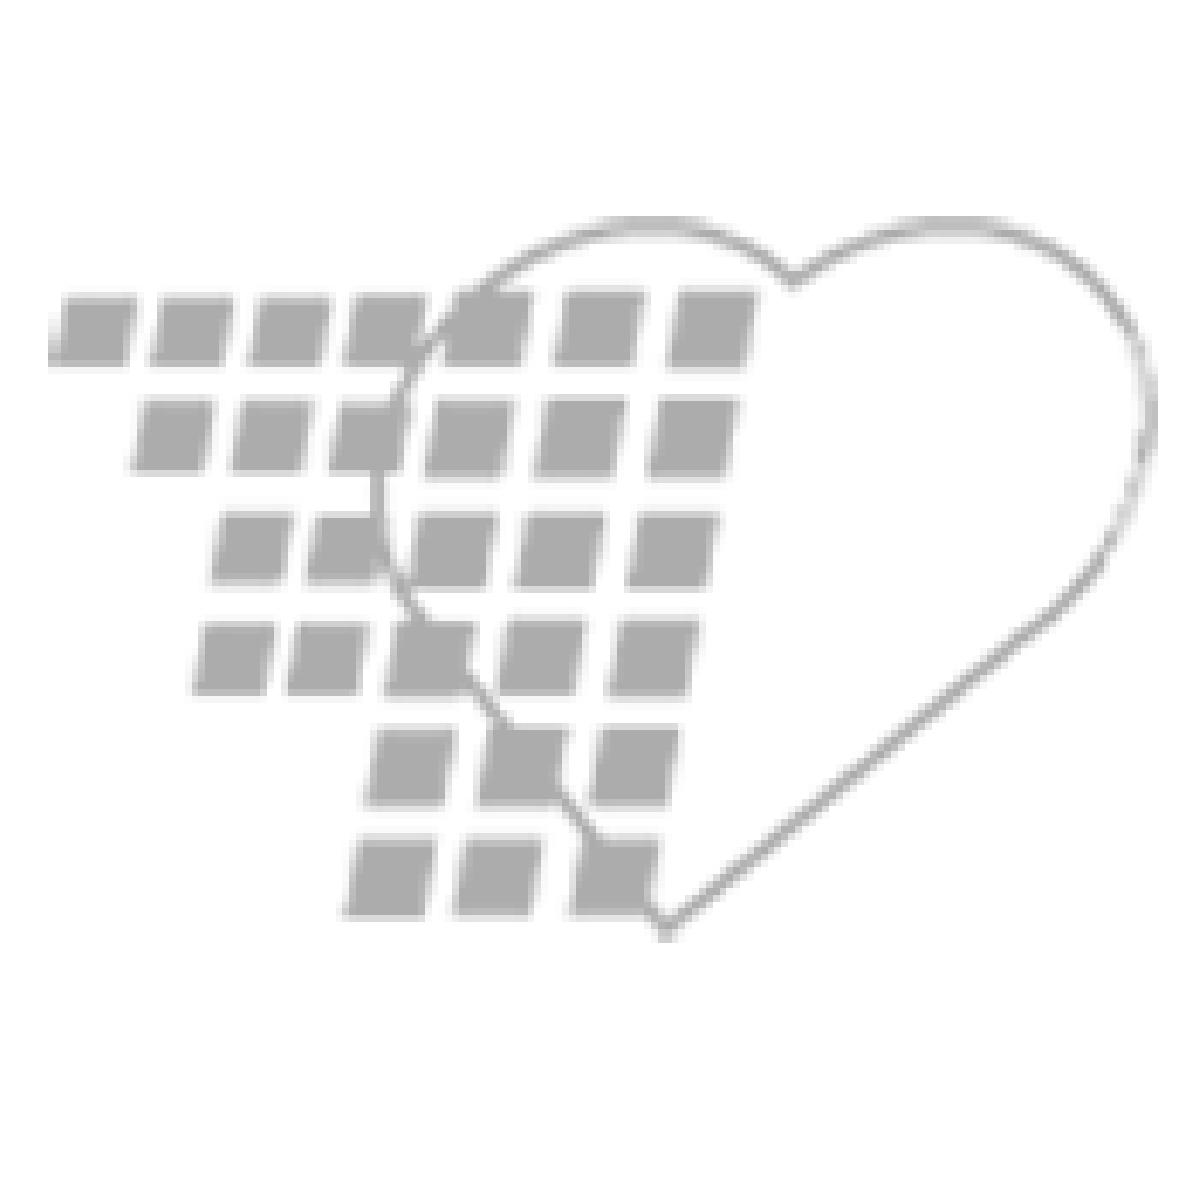 06-93-0064 - Demo Dose® Actonl 30 mg - 100 Pills/Bottle